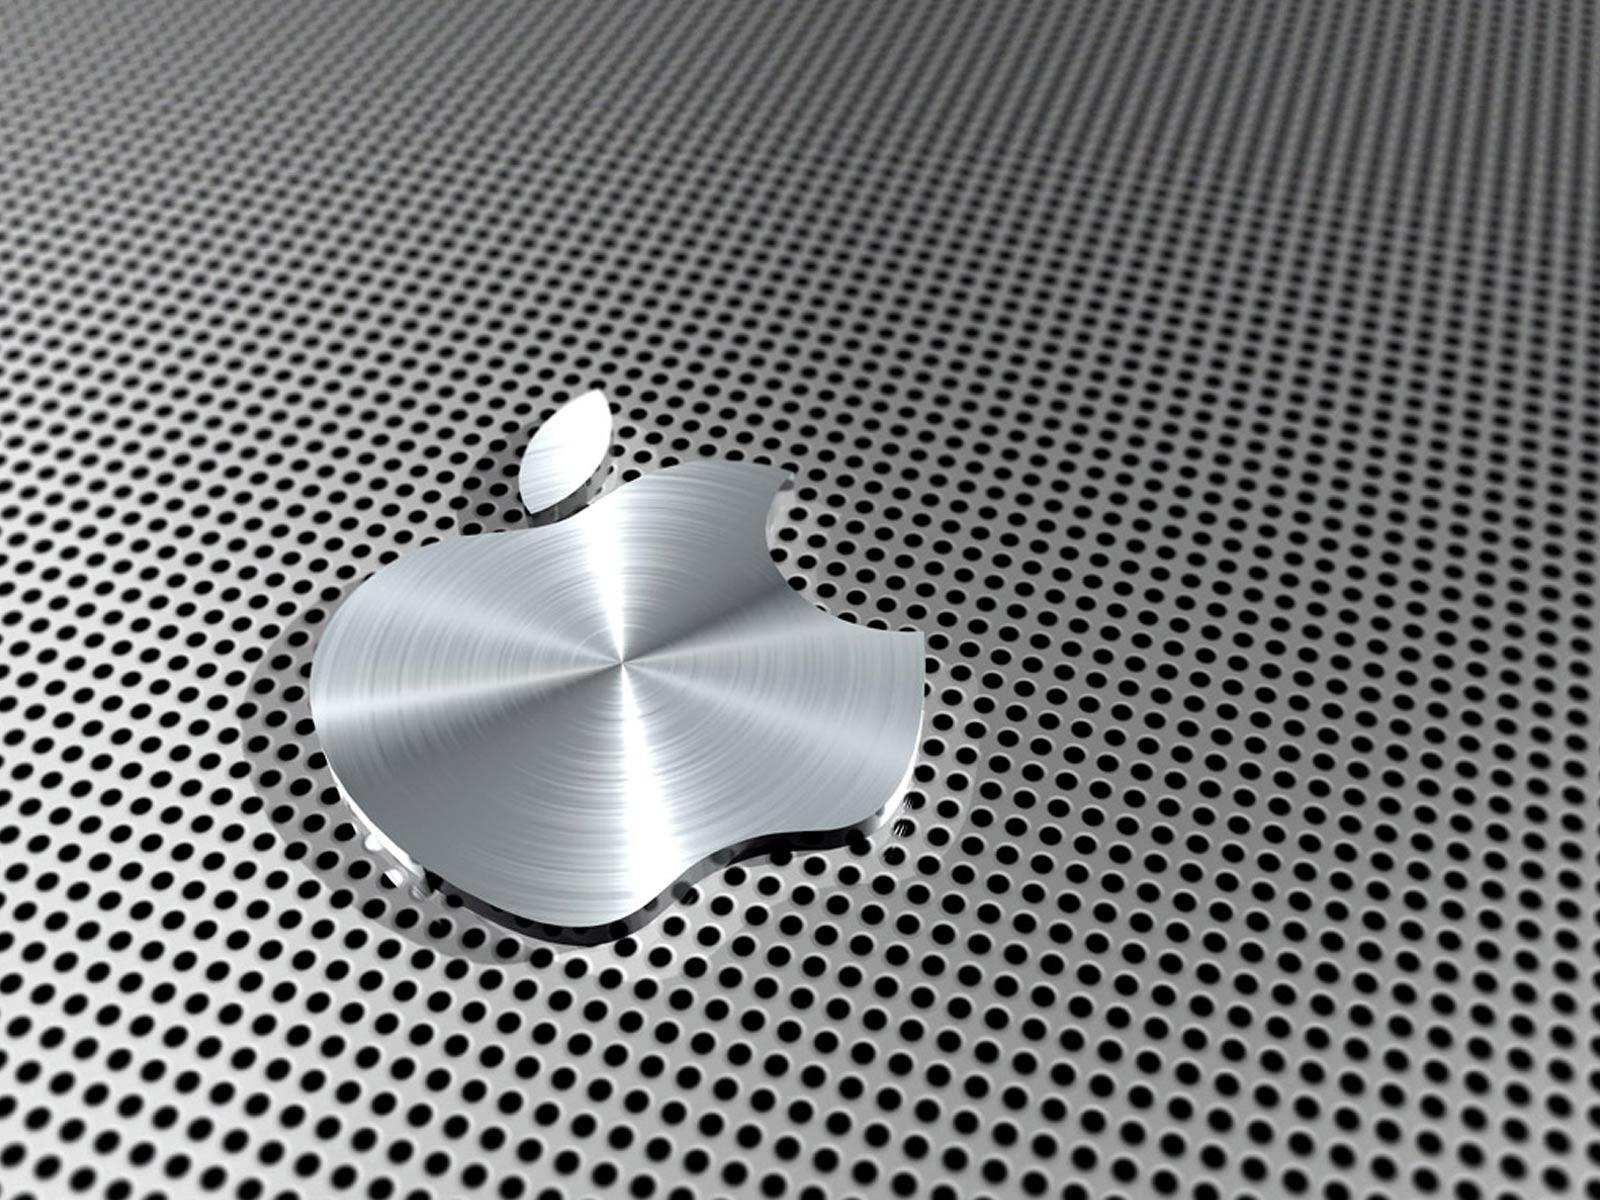 Apple, aluminum, texture, background, download, aluminum texture background